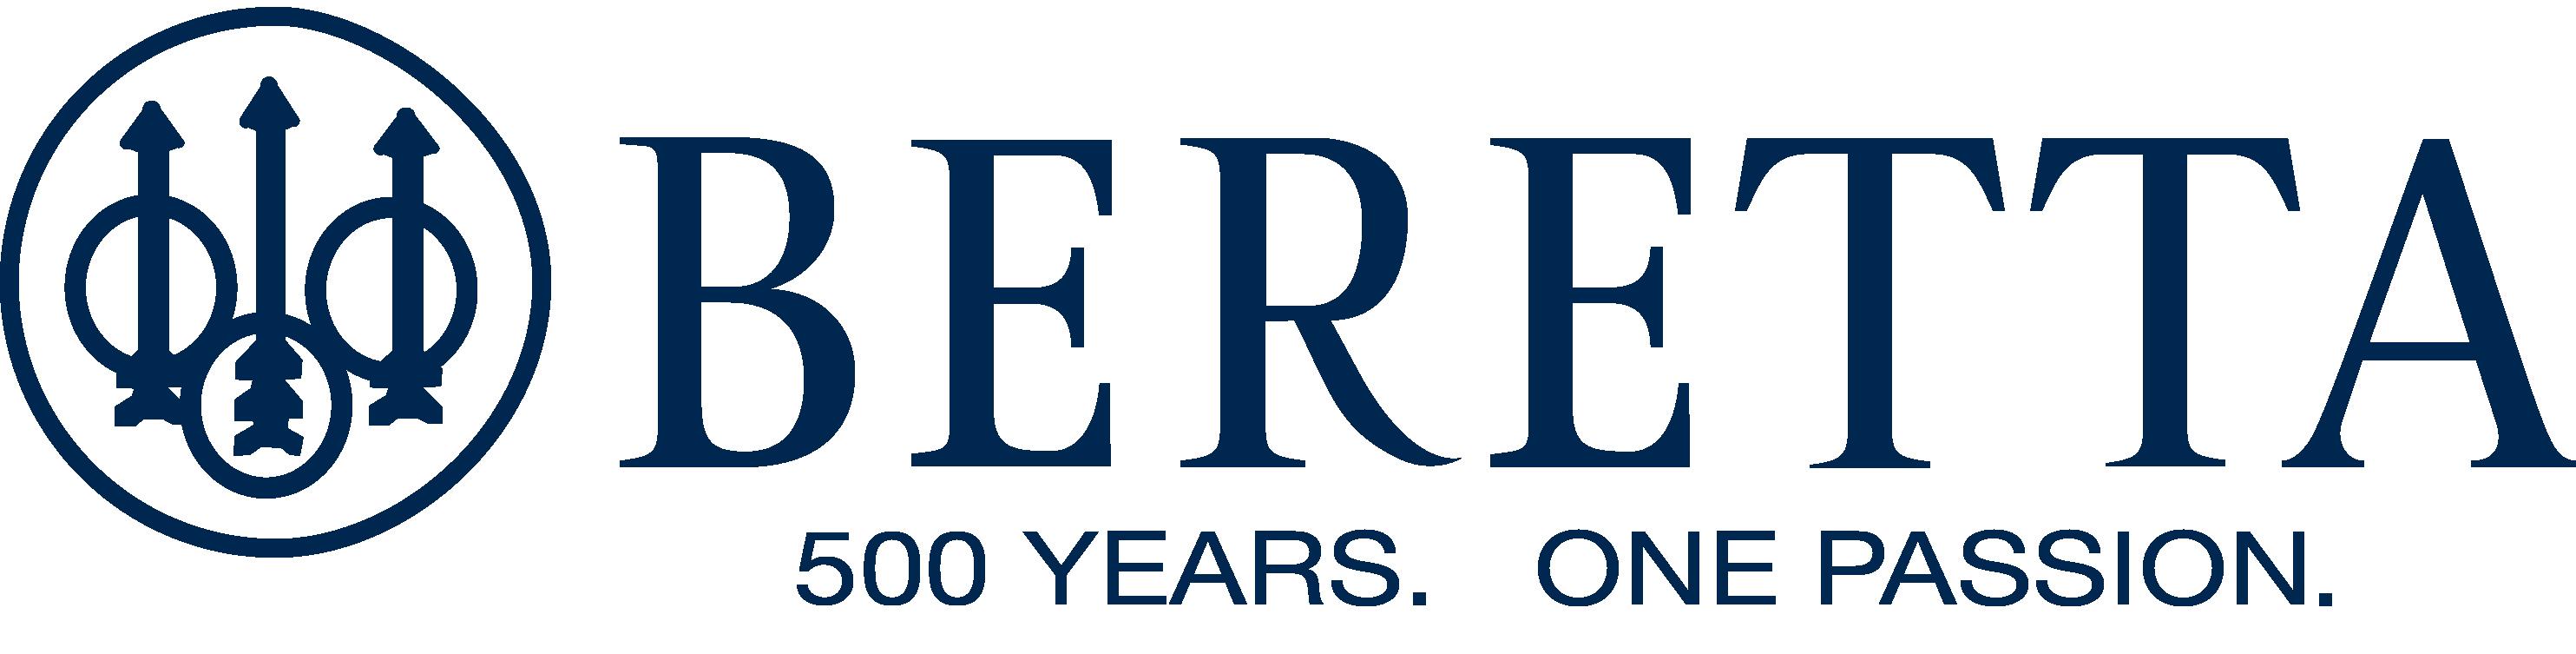 Beretta logotyp